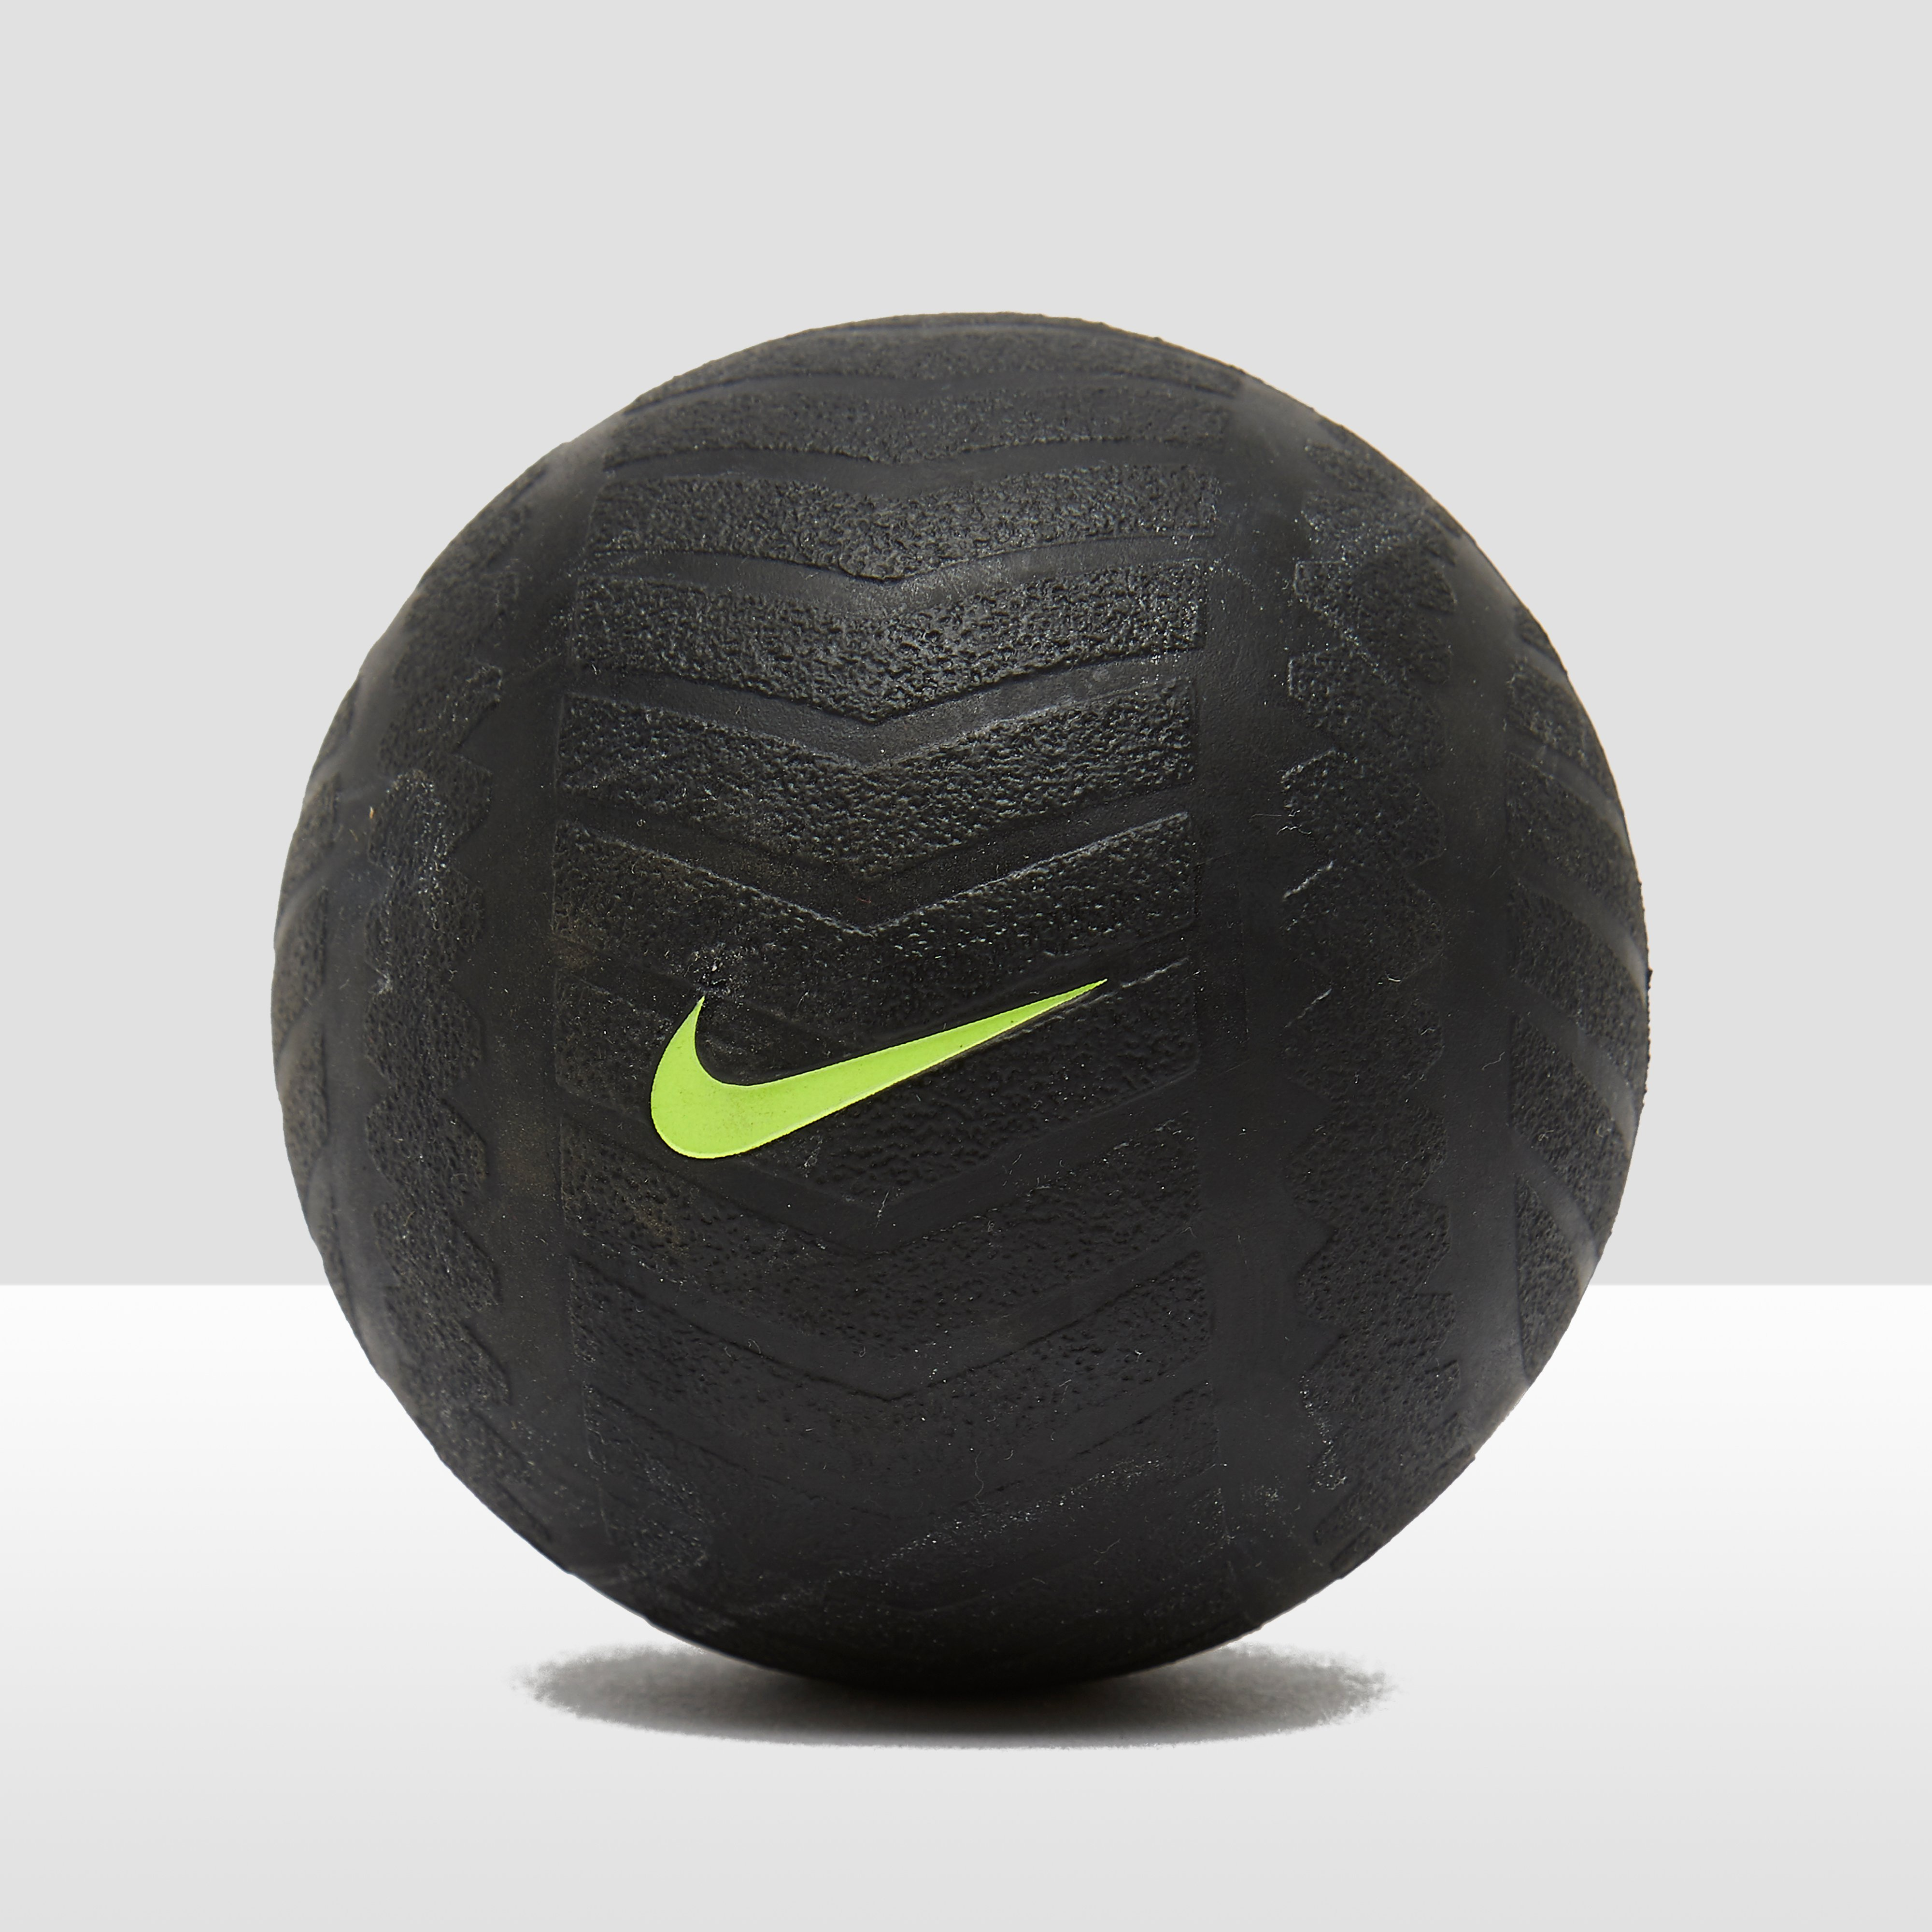 NIKE INFLATABLE RECOVERY BALL ZWART/GEEL